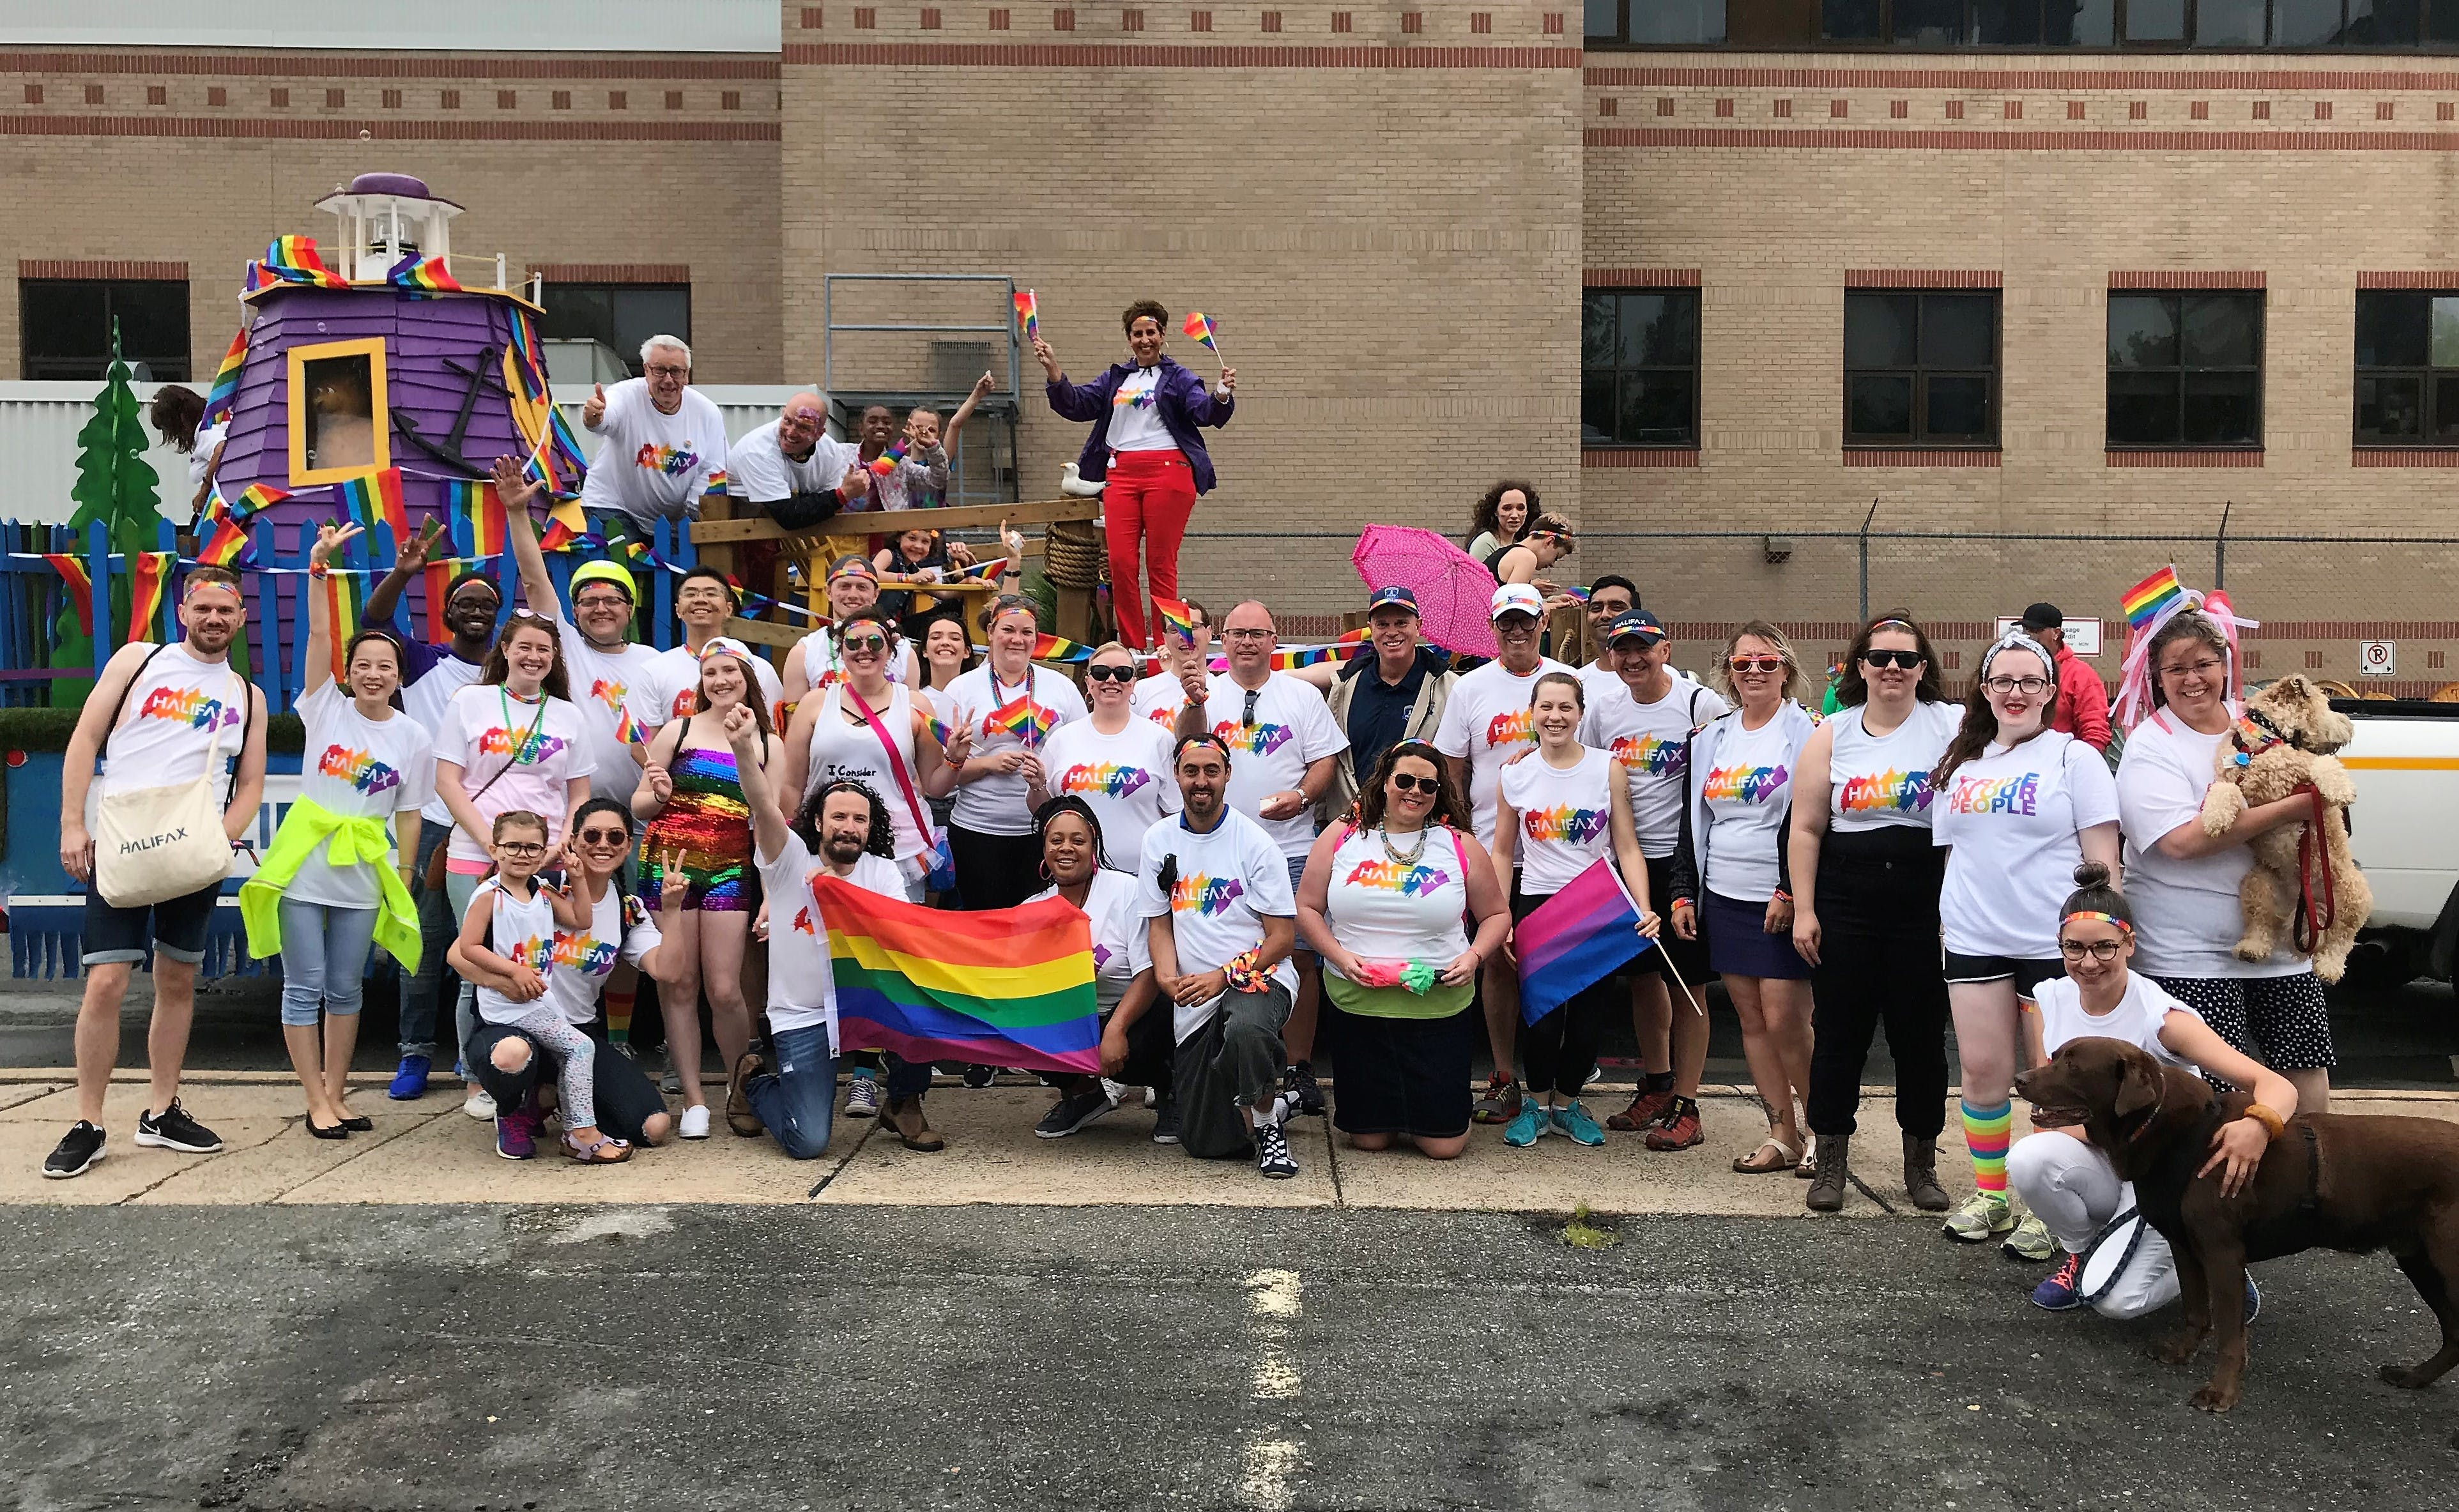 Halifax Regional Municipality employees celebrating at the Halifax Pride Parade, July 2018